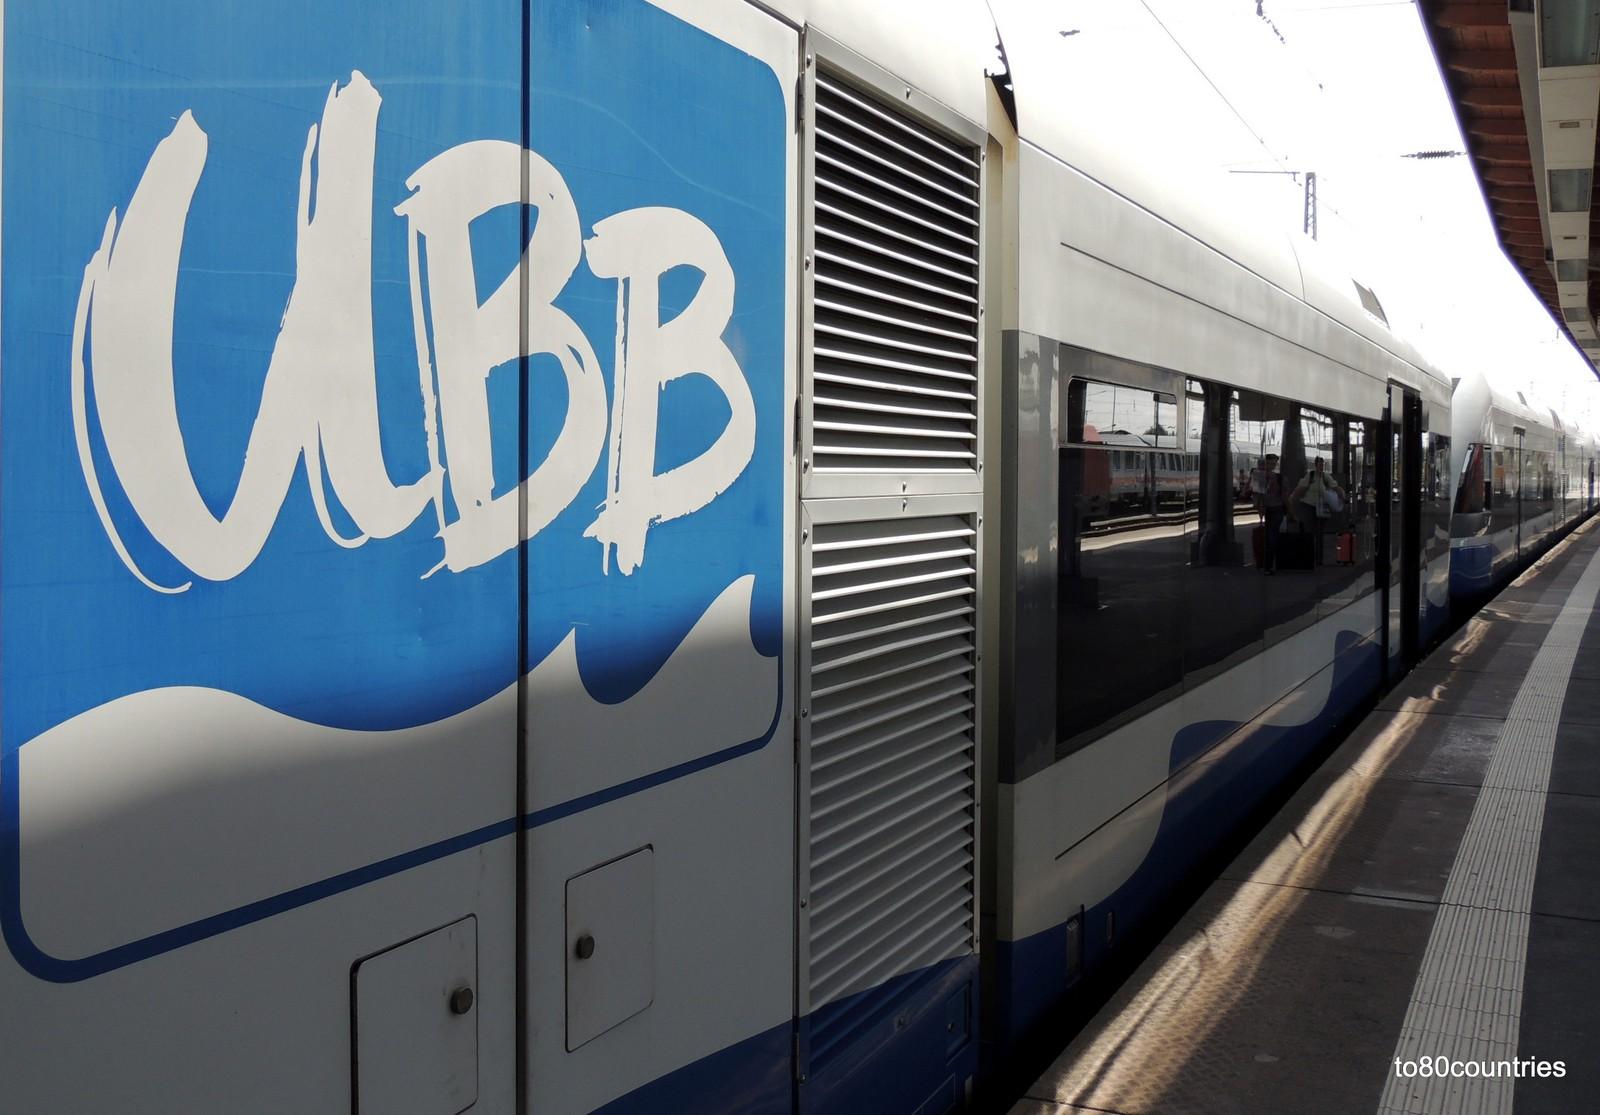 Usedomer Bäderbahn UBB